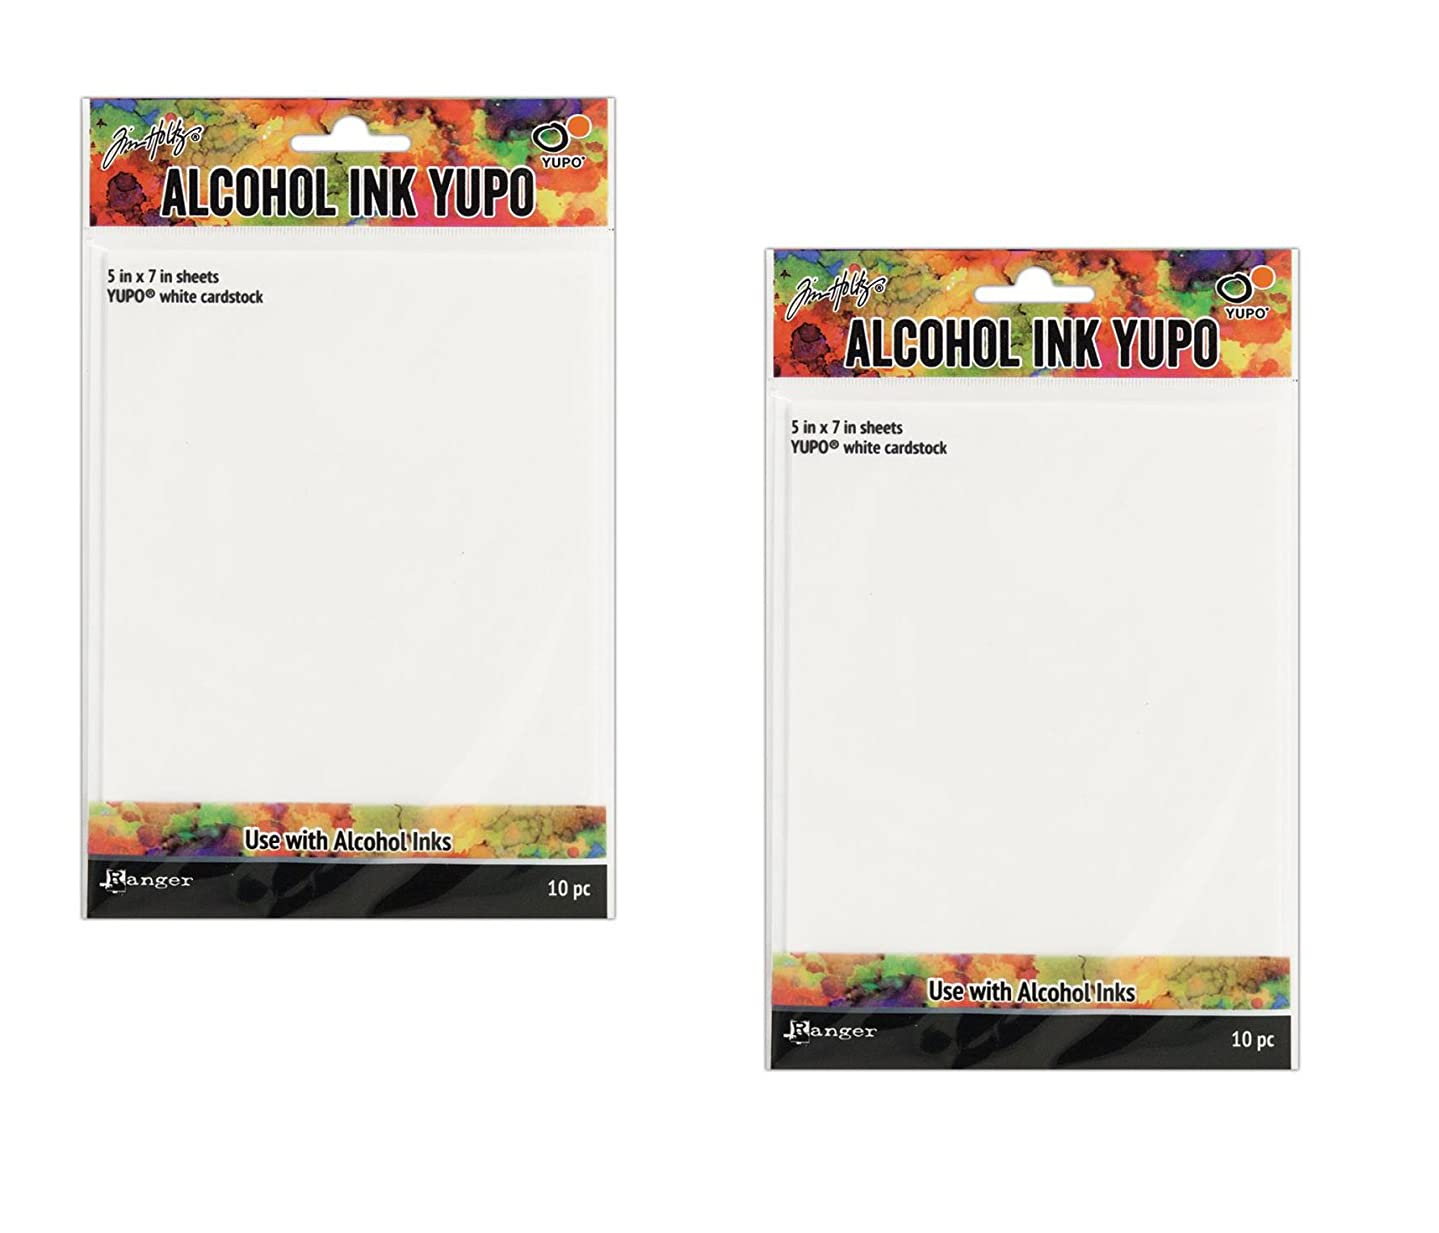 Ranger Tholtz Alcohol Ink Yupo Paper 5x7 White (2 packs)